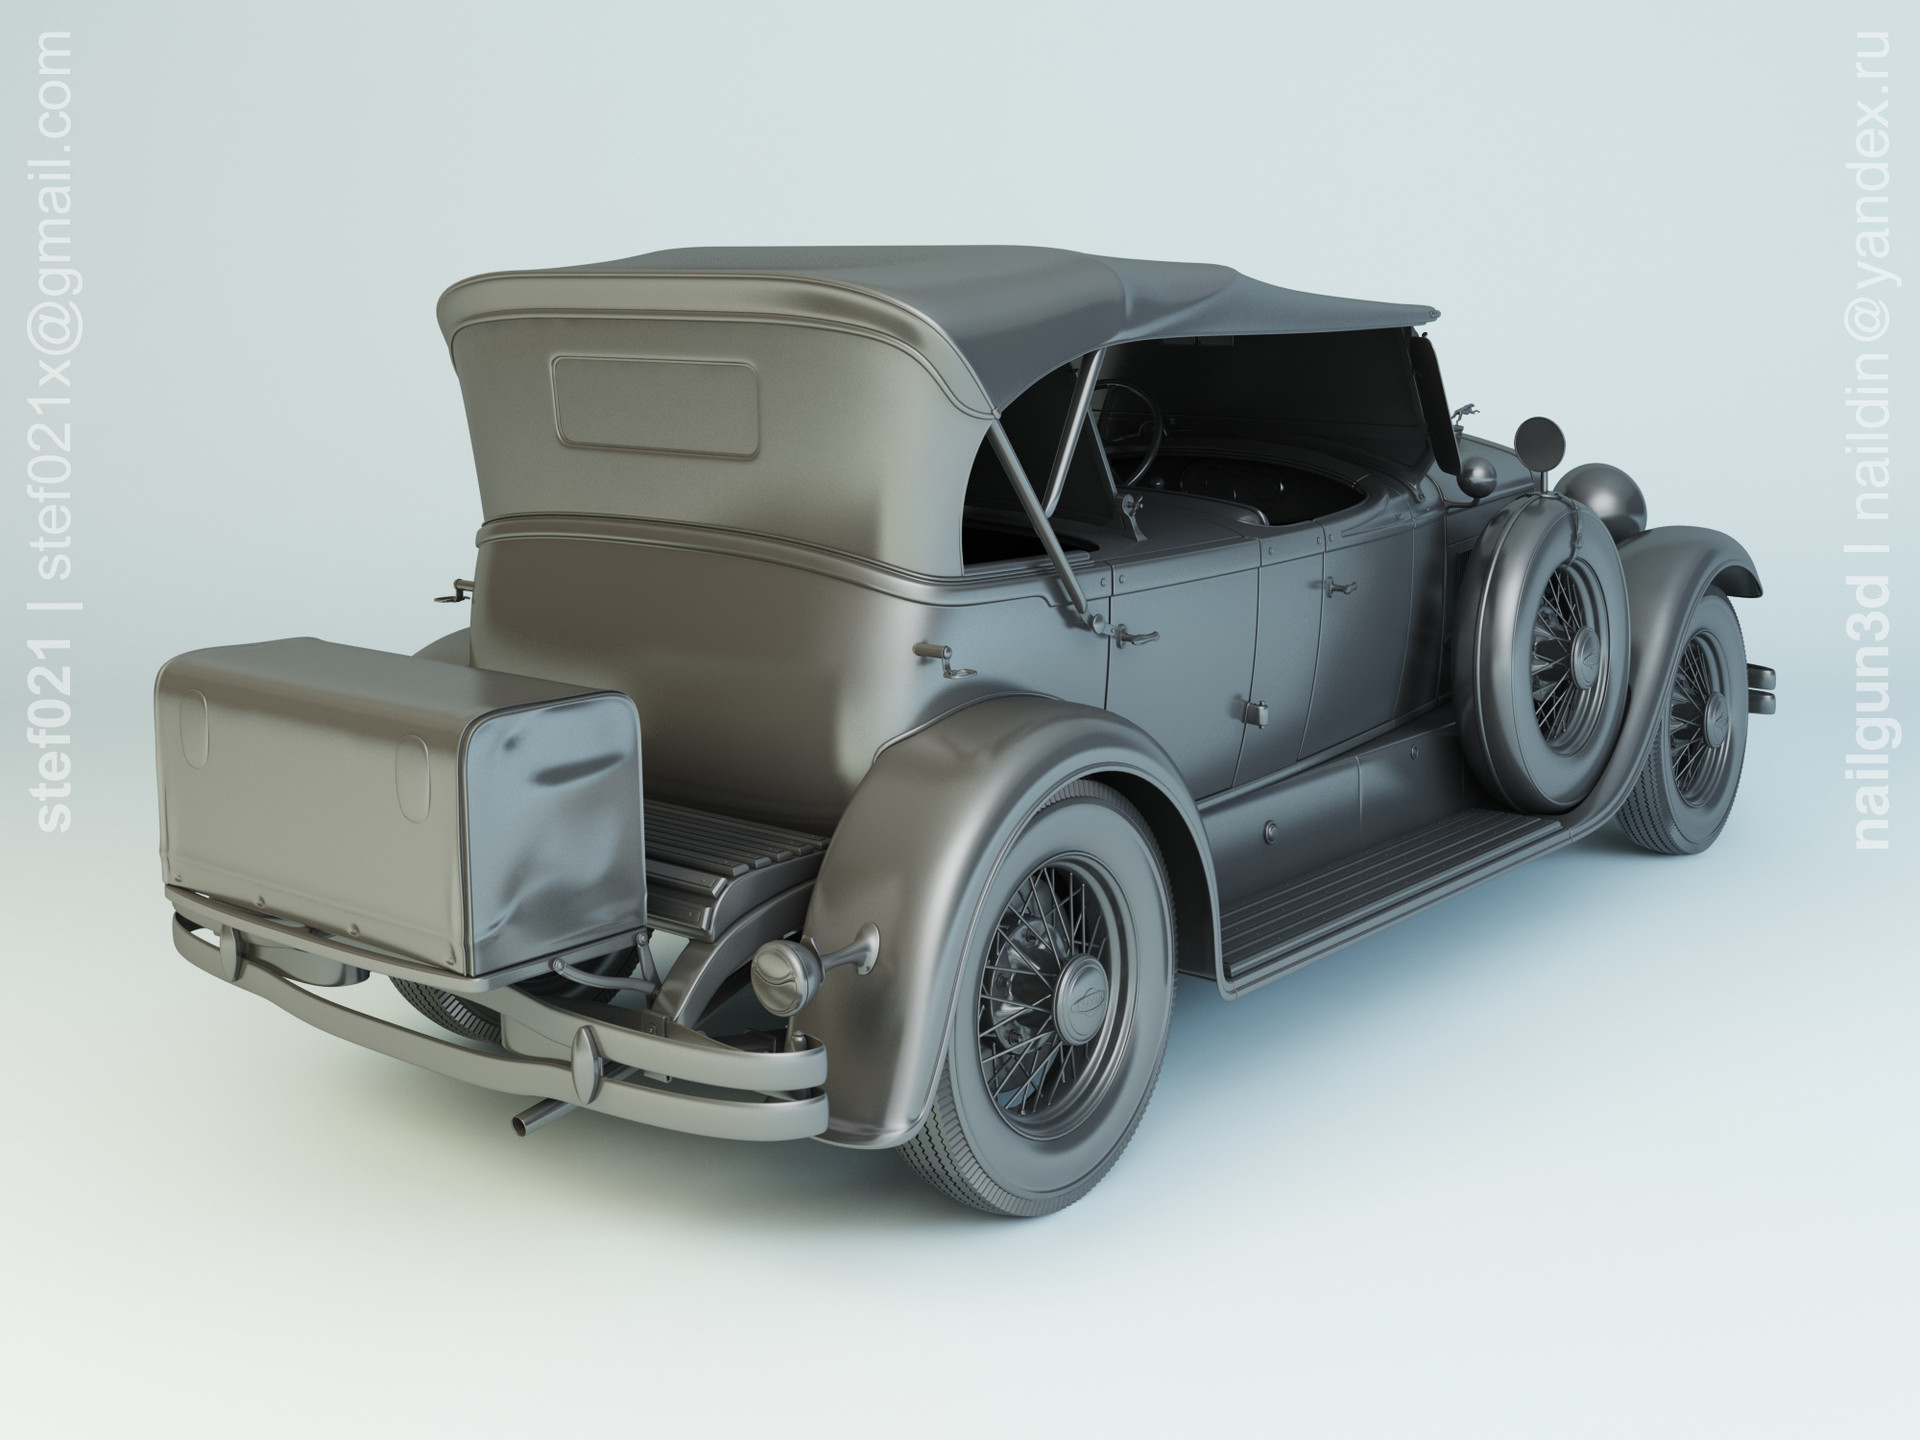 Nail khusnutdinov a0012 000 lincoln molel l 1930 modelling 1